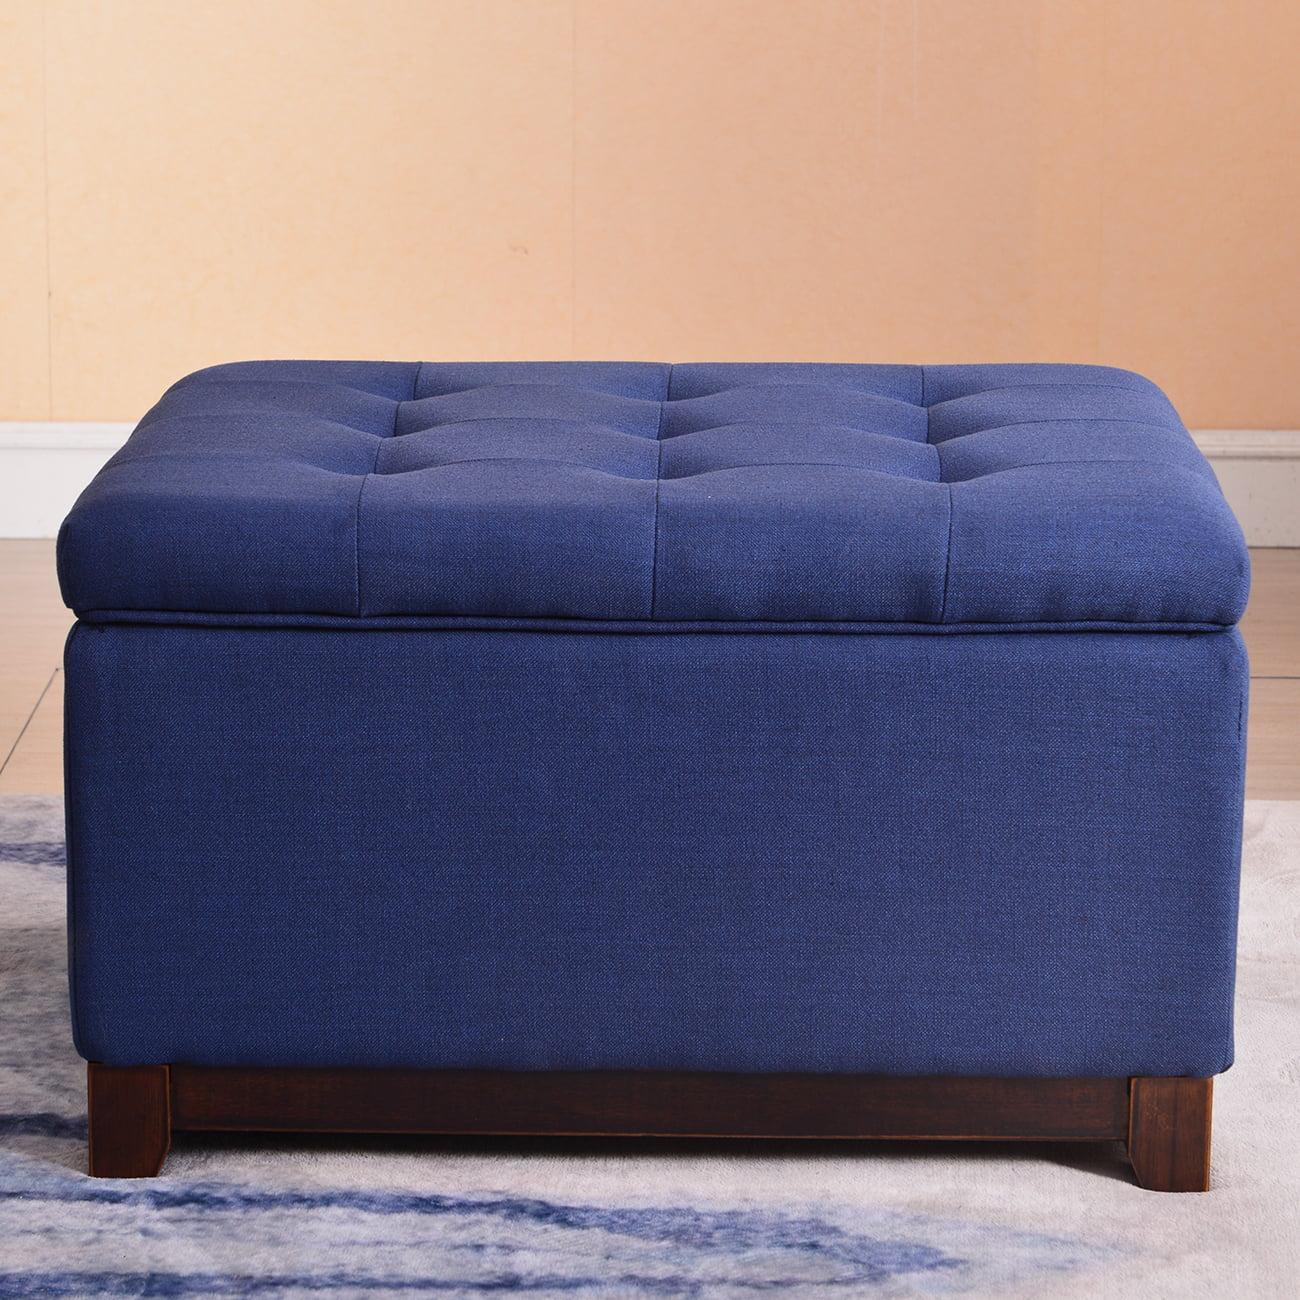 Belleze Linen Ottoman Storage Bench Stool Large Footrest